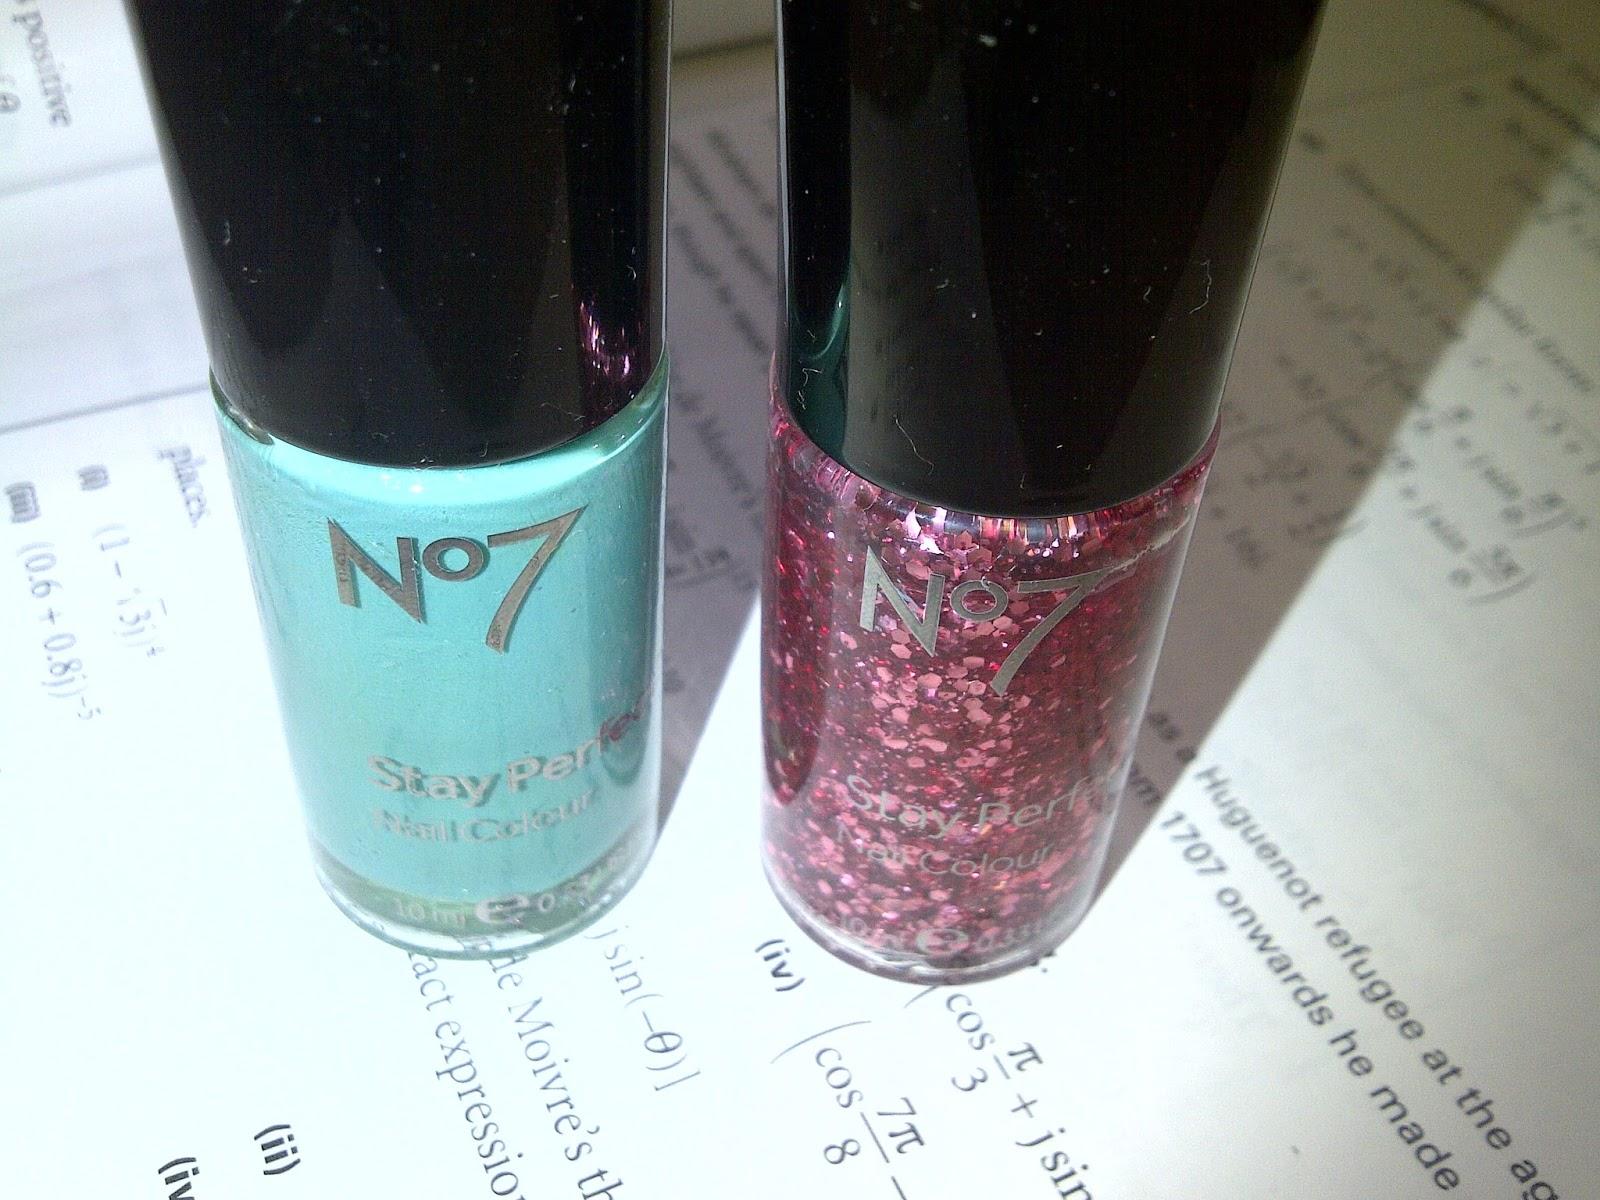 Anna, Look!: Nail polish experiment: mixing No7 So Neat with No7 ...